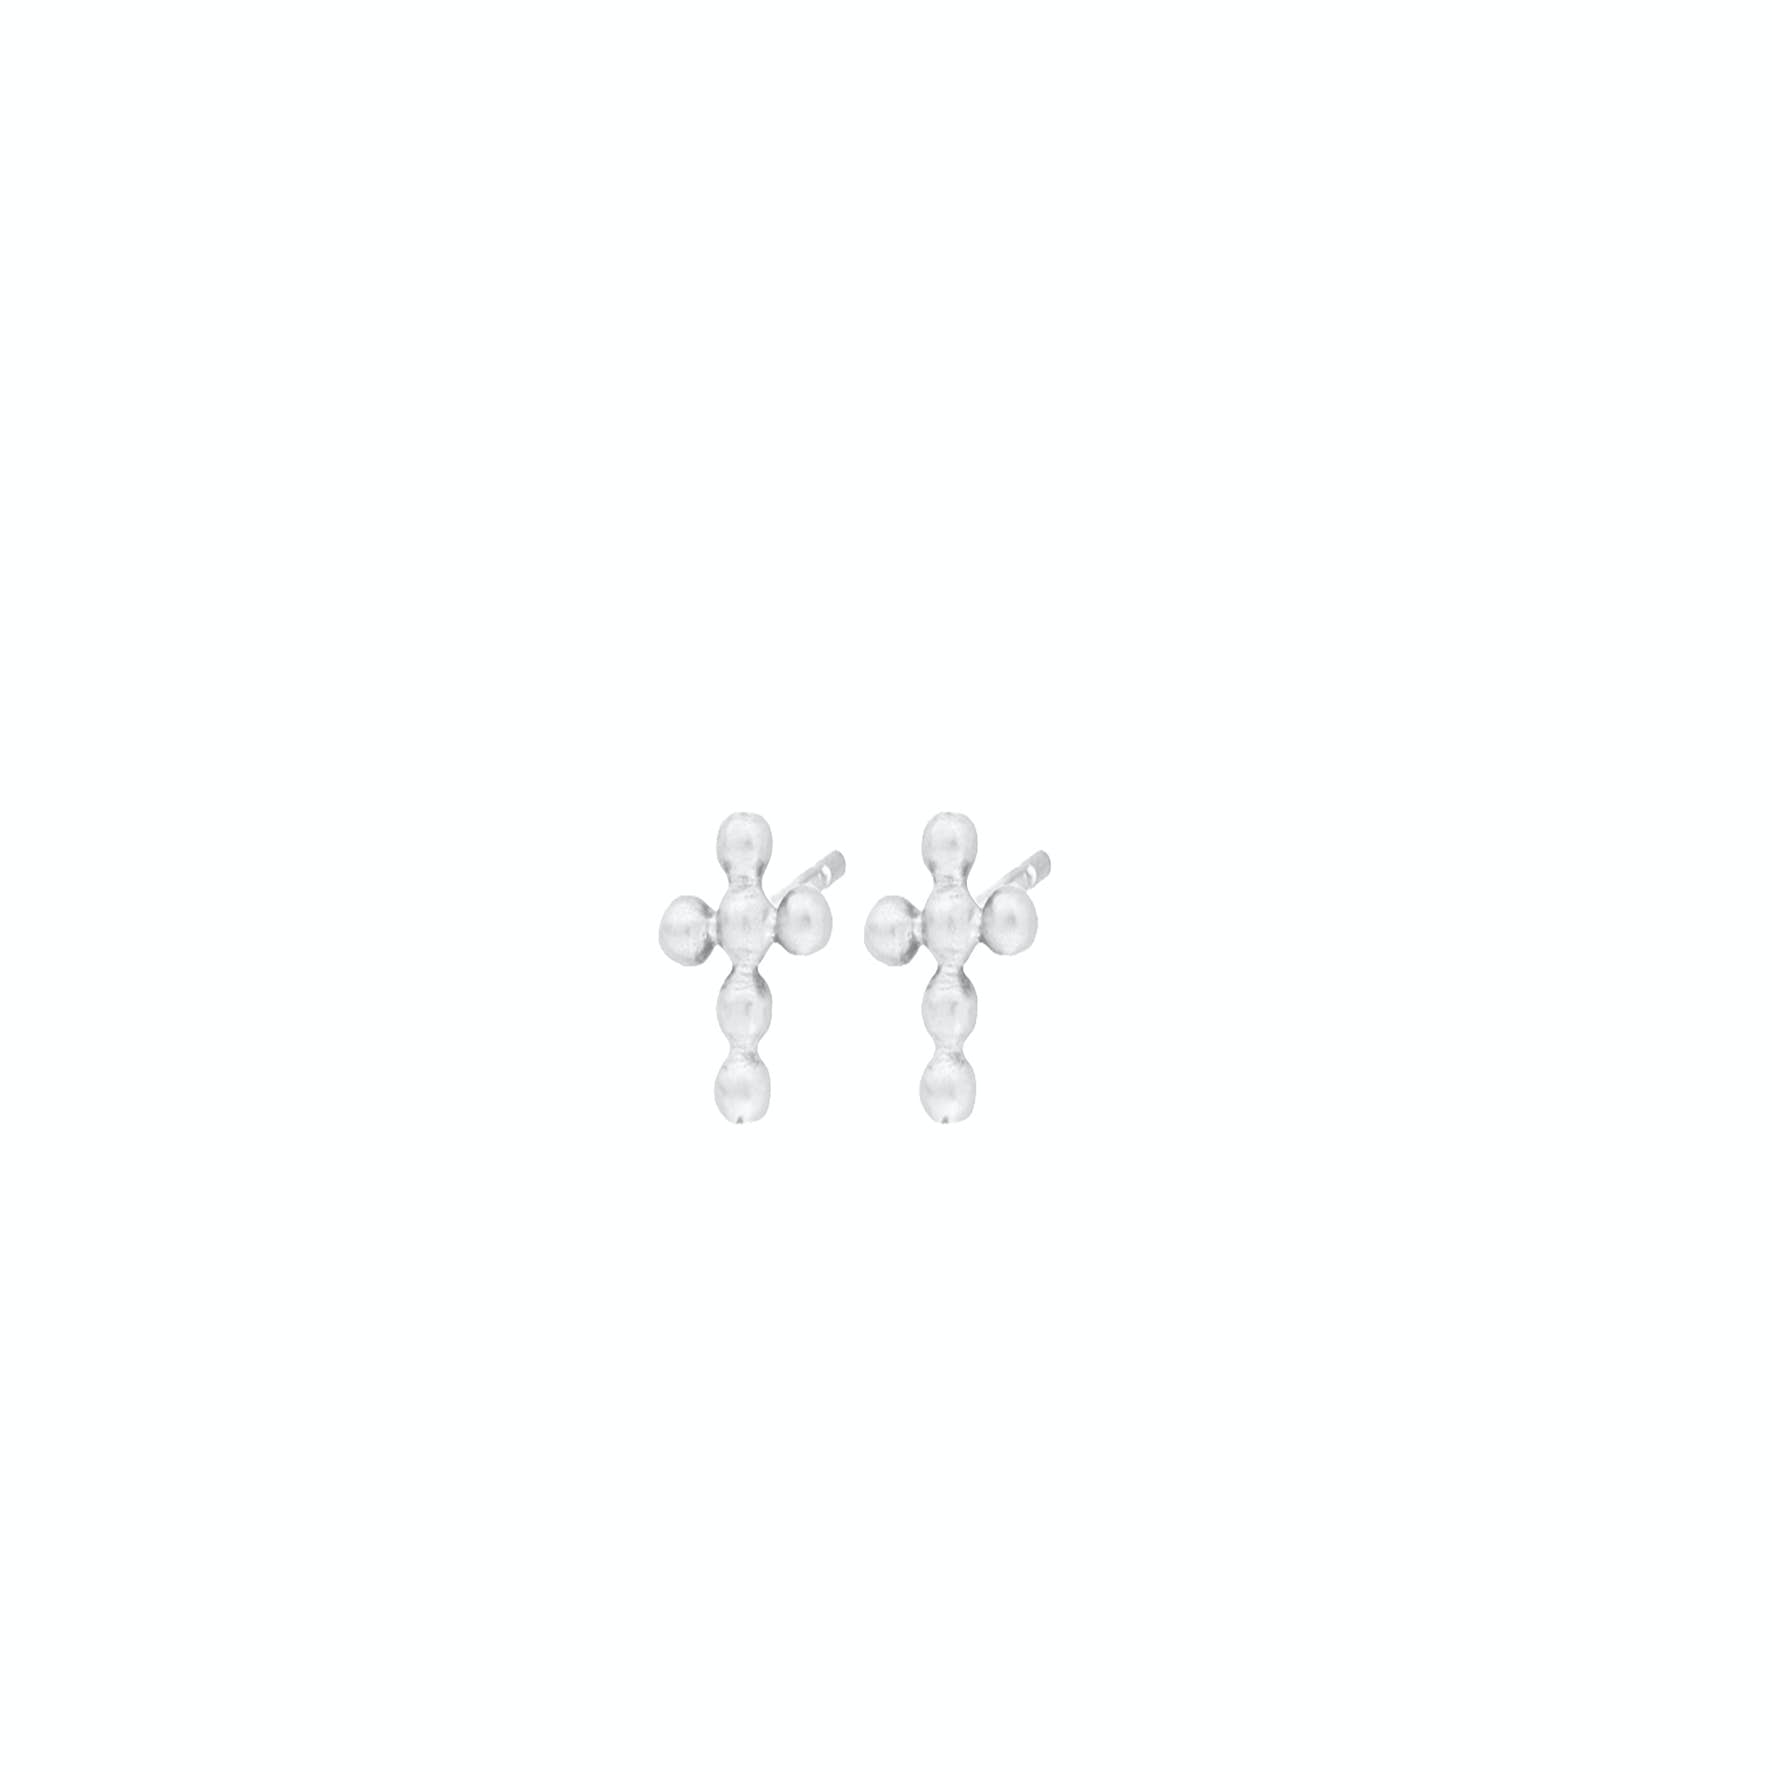 Cross Earsticks från Pernille Corydon i Silver Sterling 925